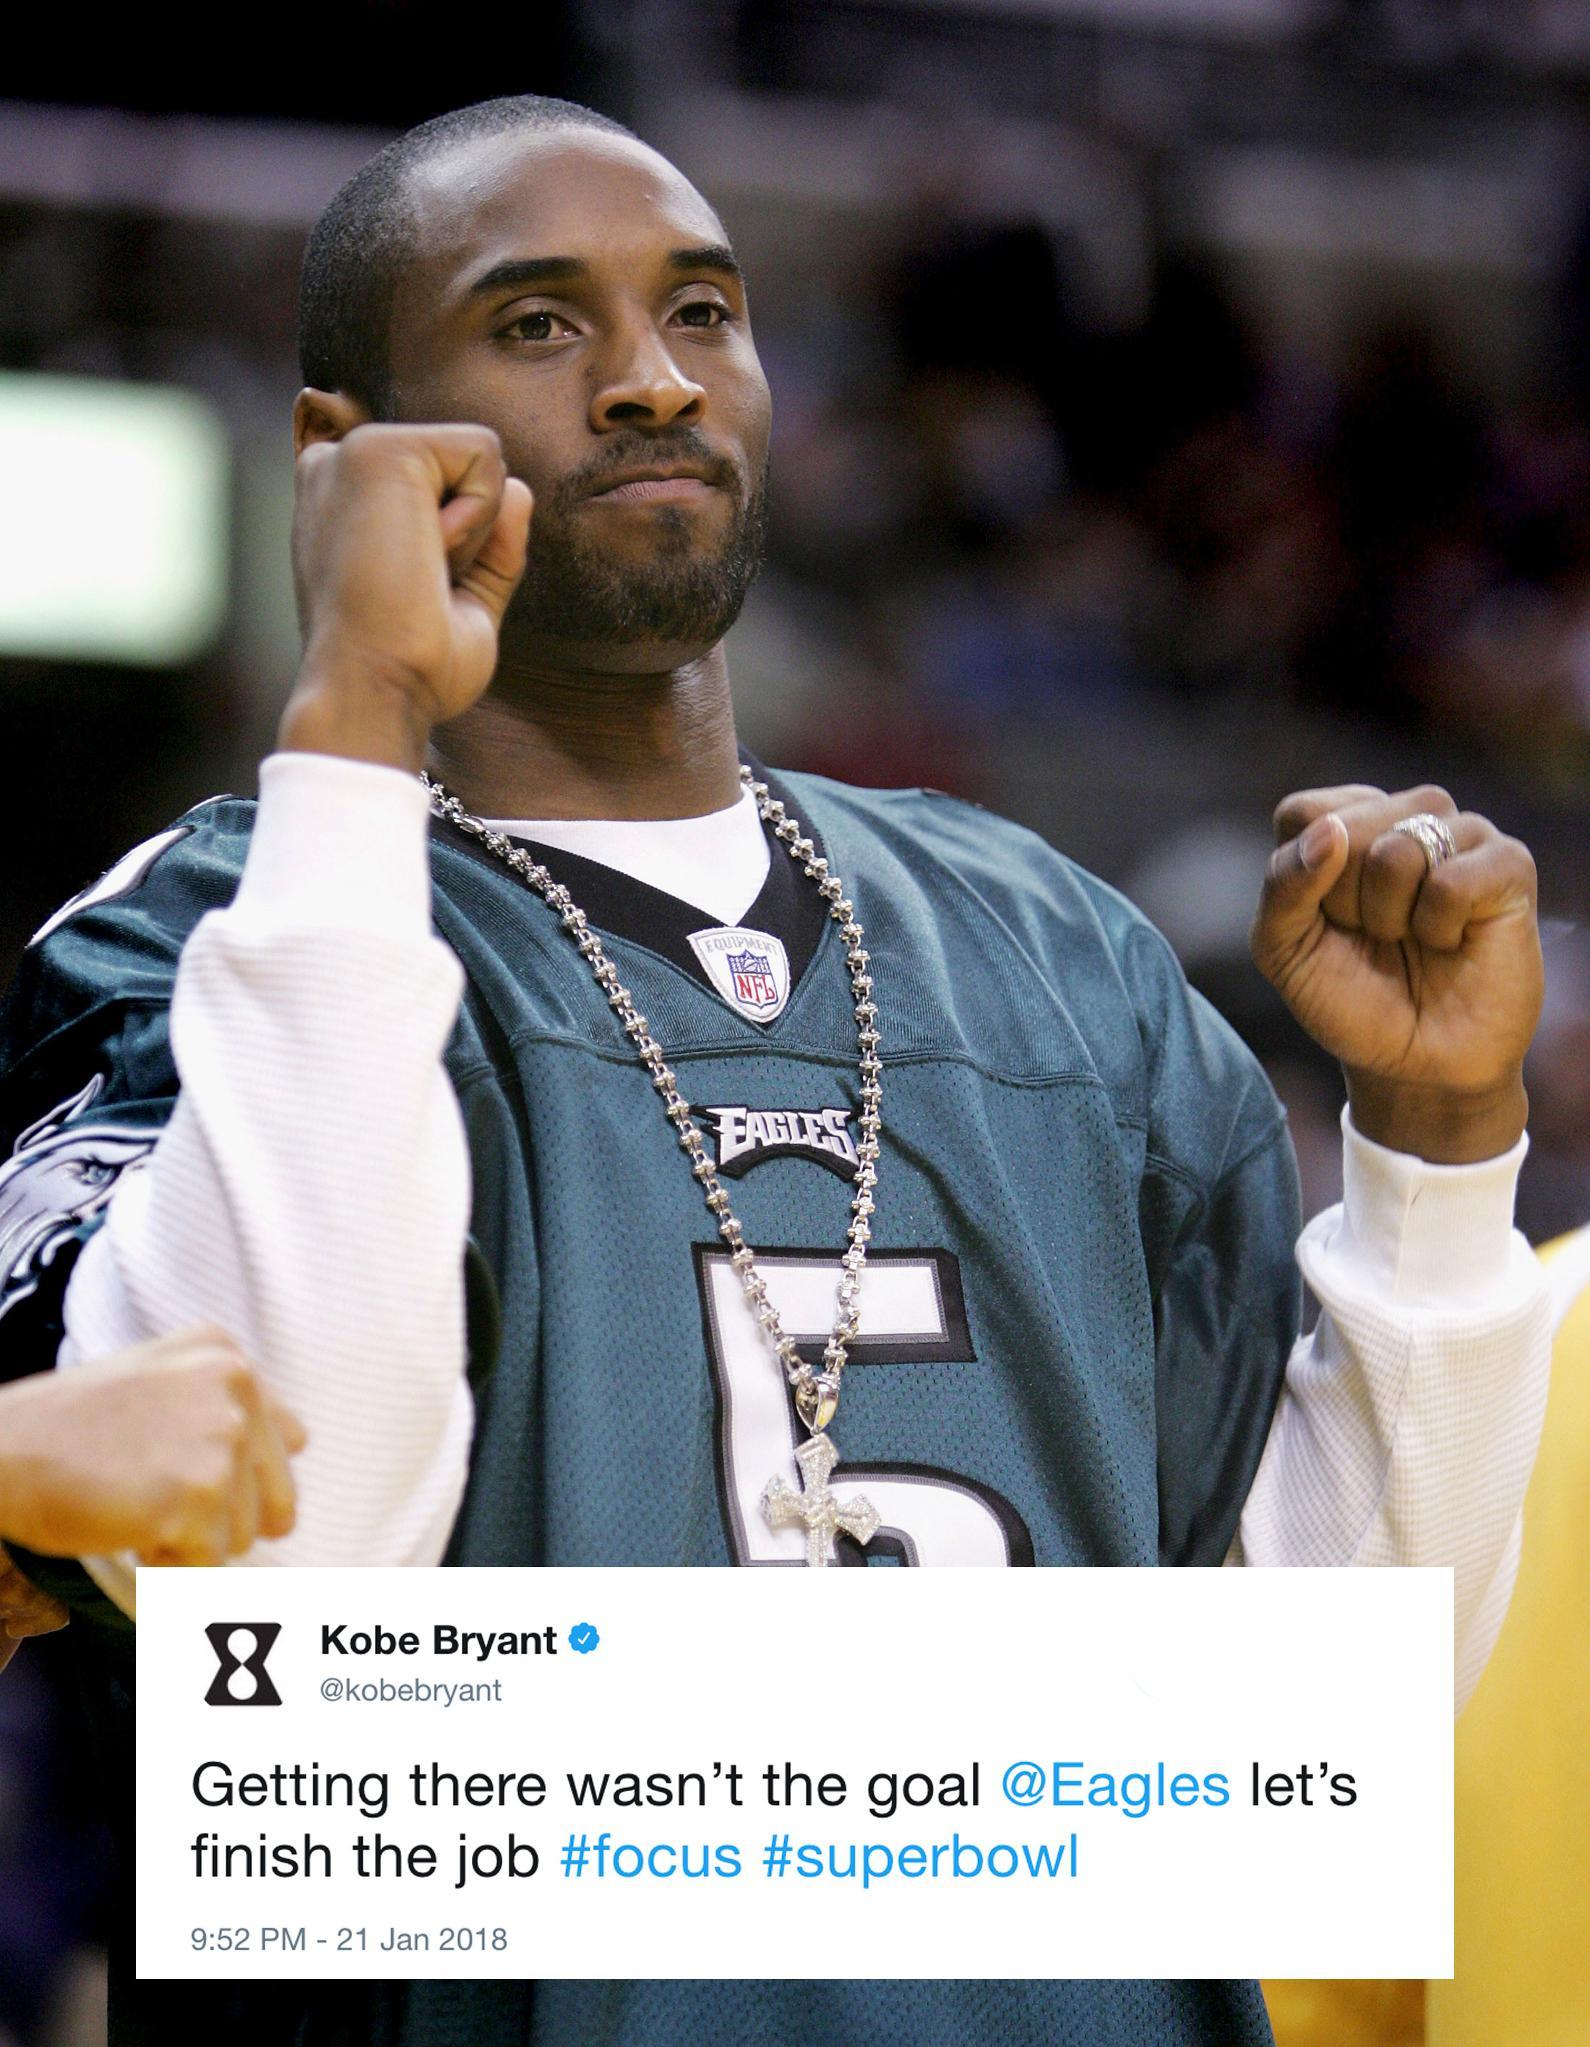 Kobe is ready for the Super Bowl. https://t.co/BkWaqARJYr